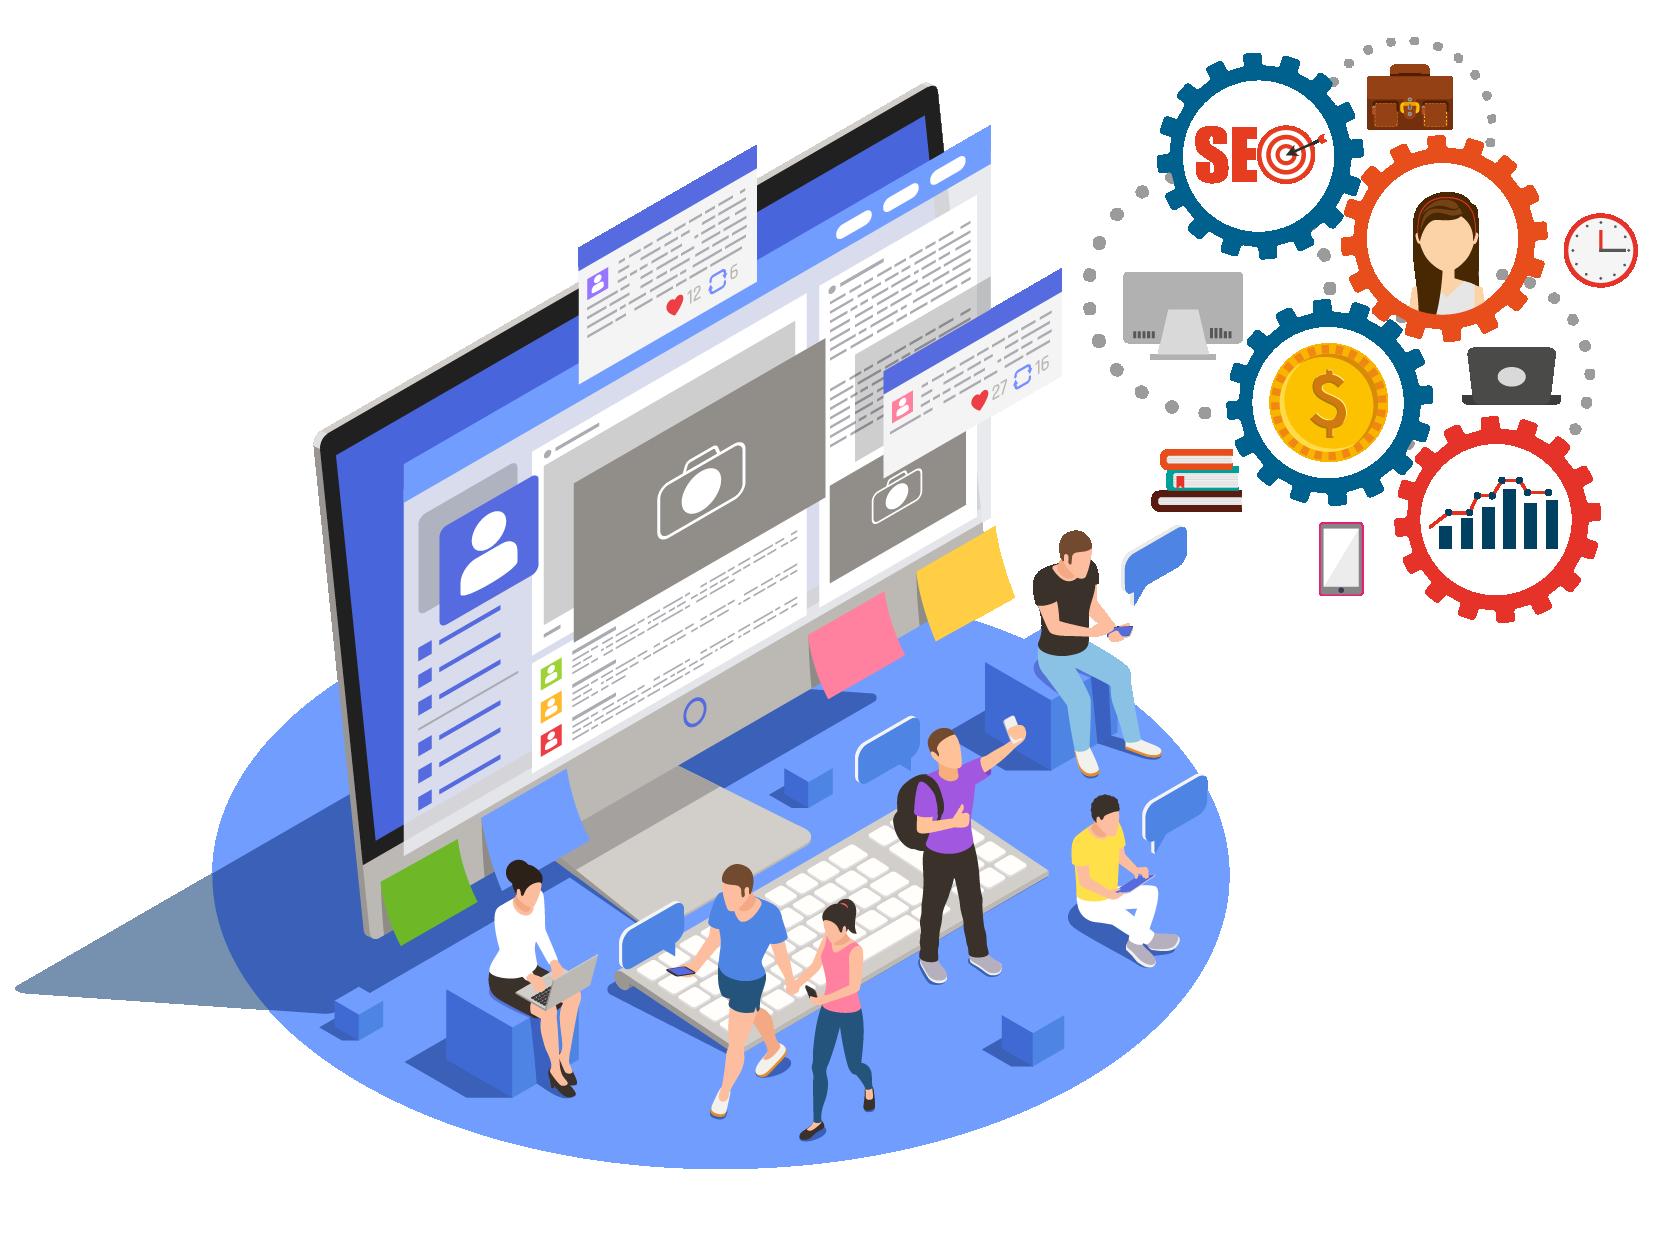 Paid Search Engine, Social Media Marketing